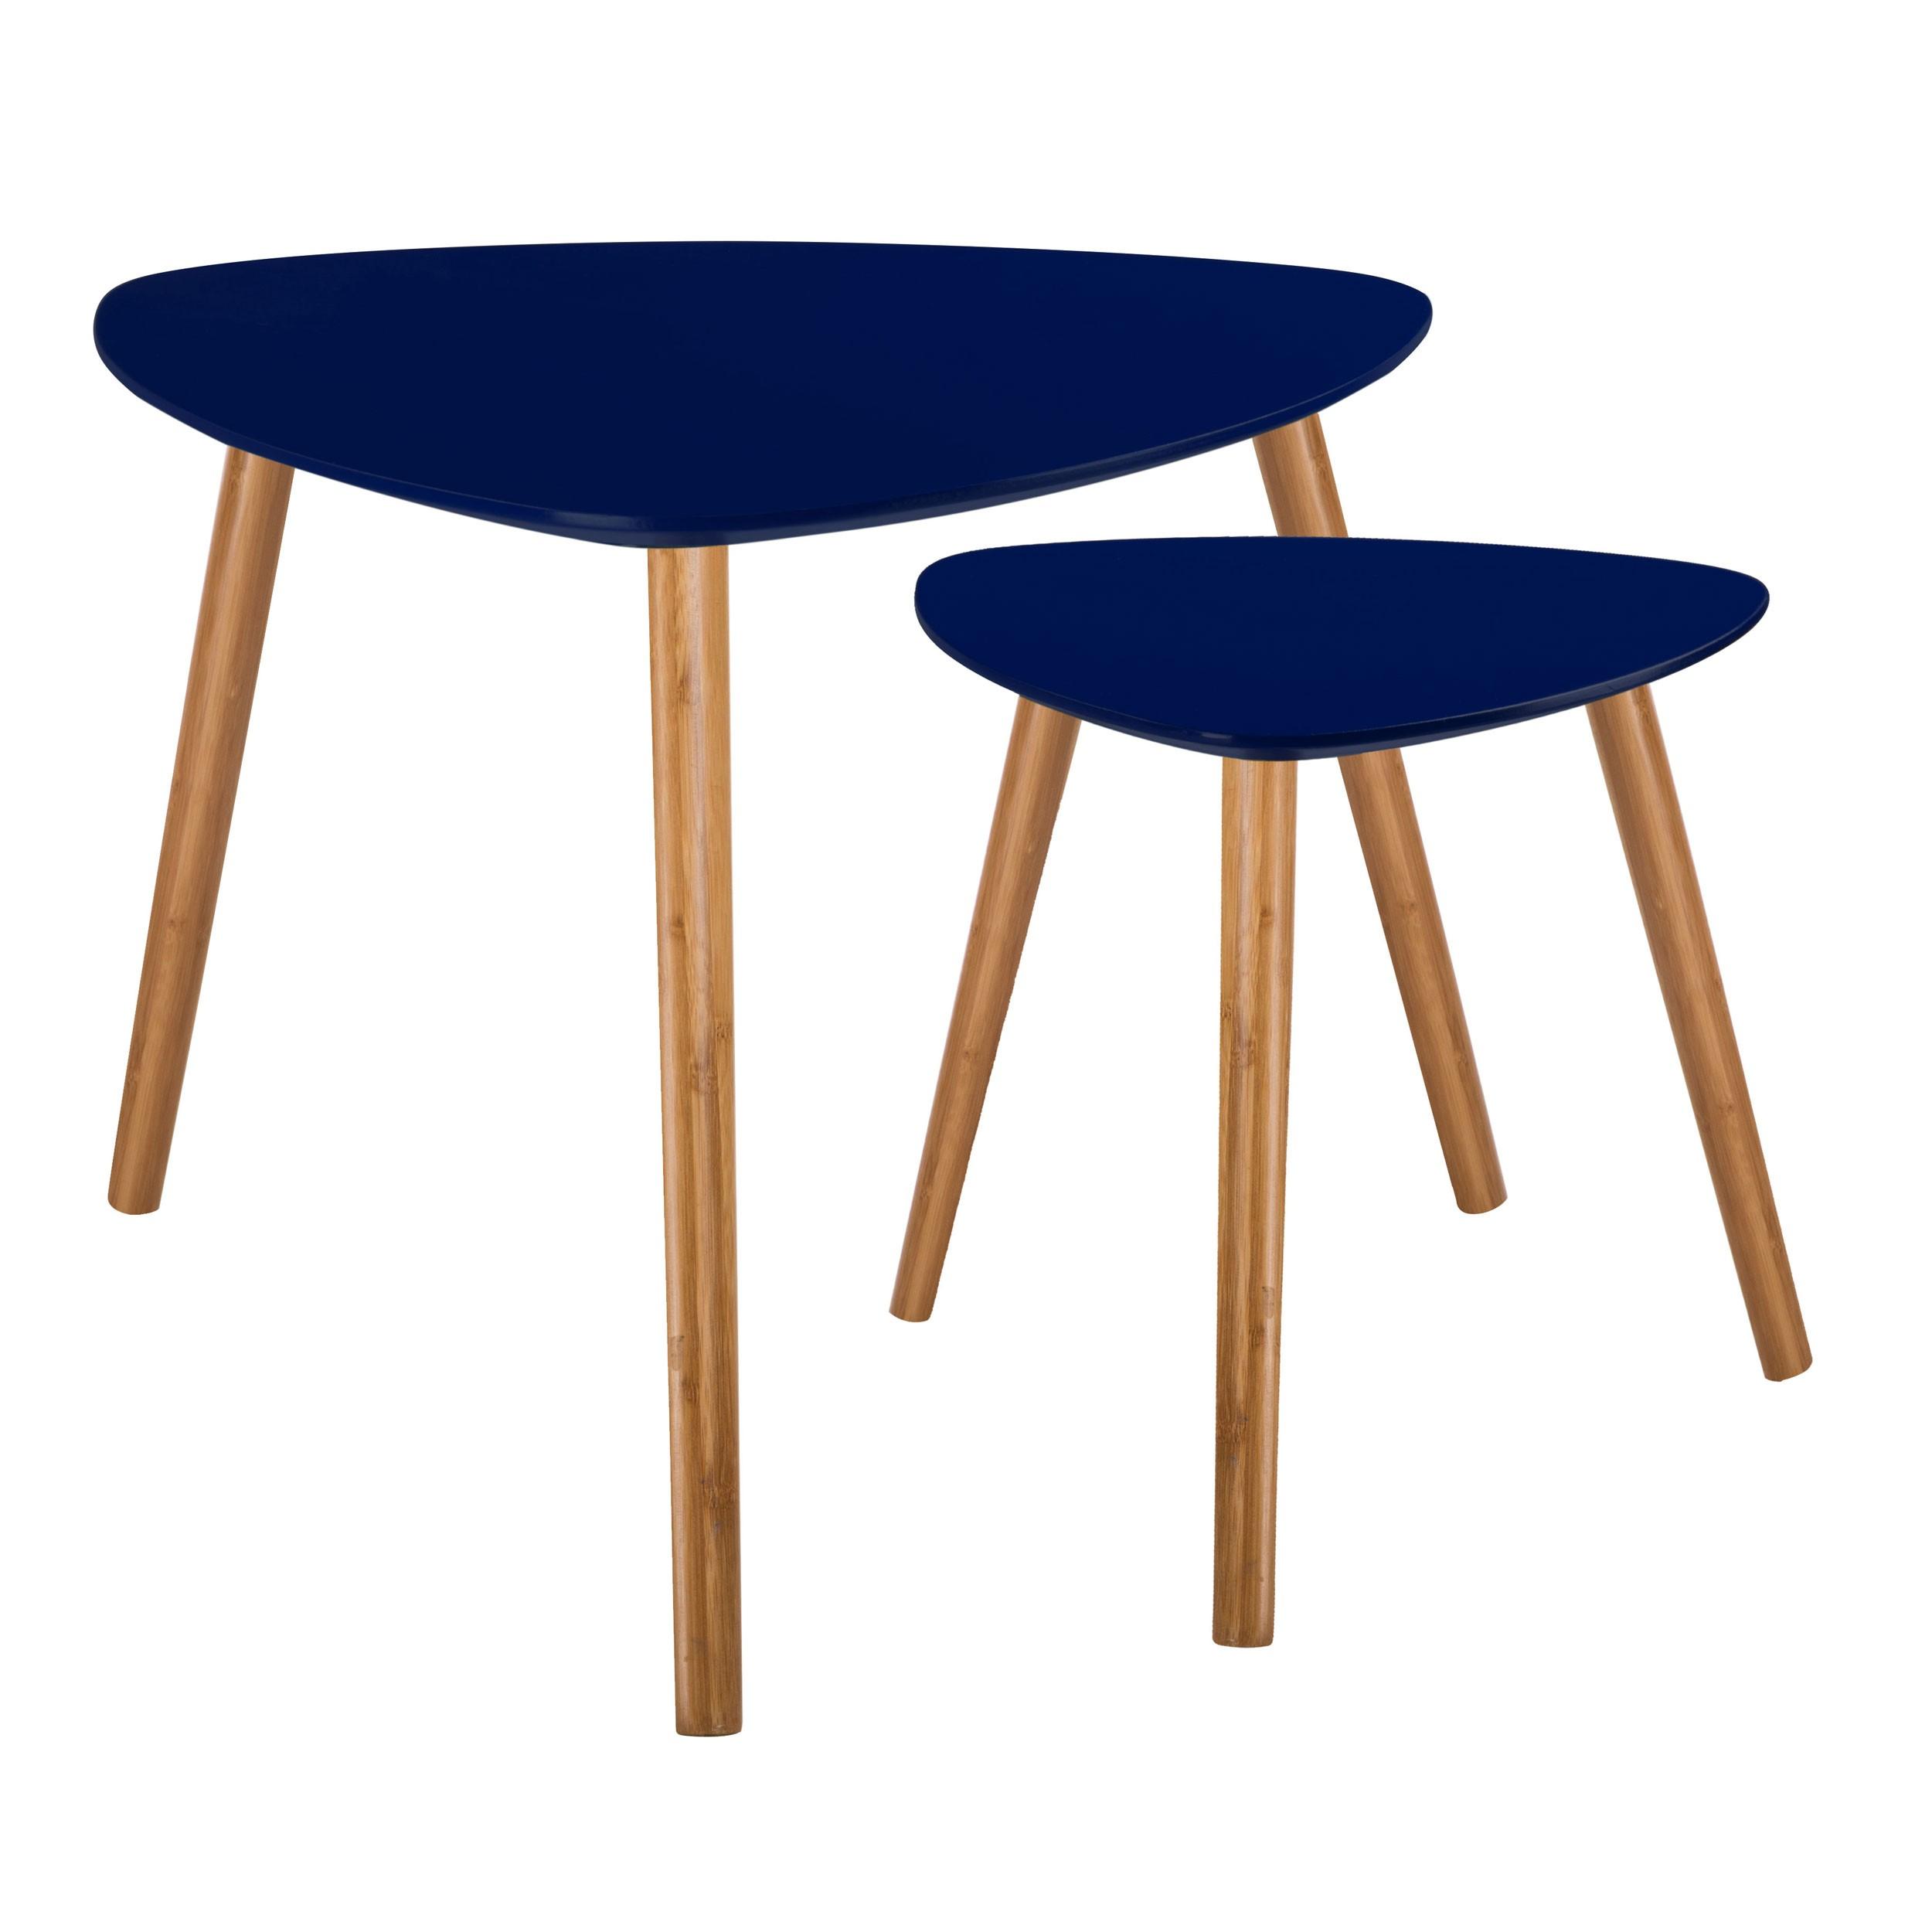 table basse scandinave bleu fonce lot de 2